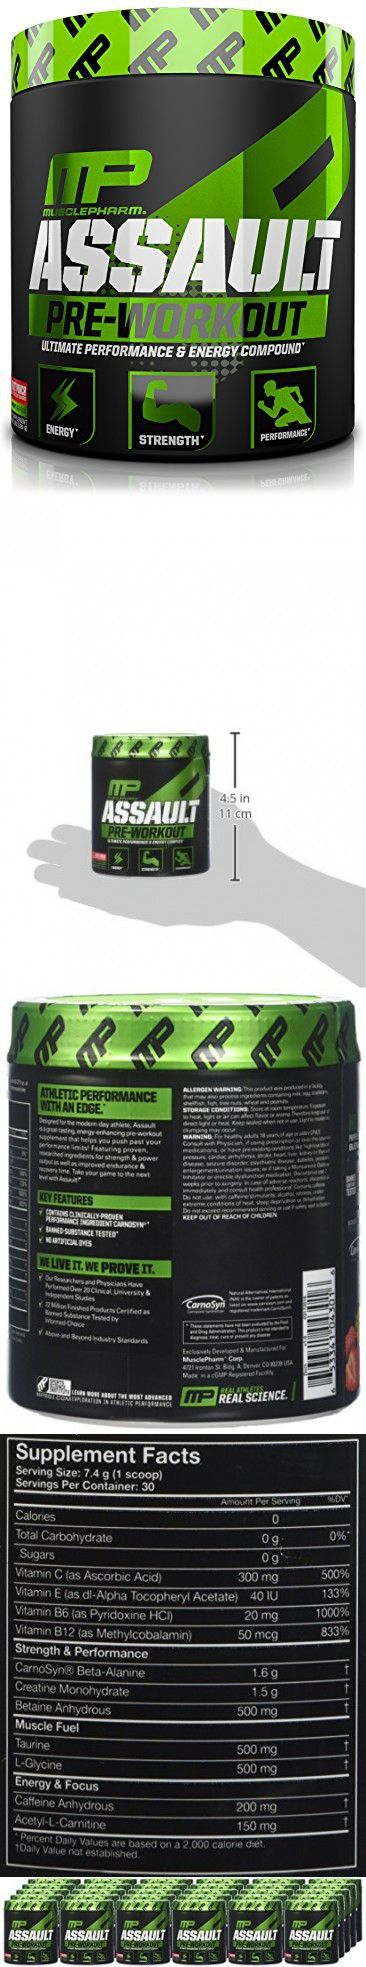 Muscle Pharm Assault Pre-Workout Powder, Fruit Punch, 30 Serivings